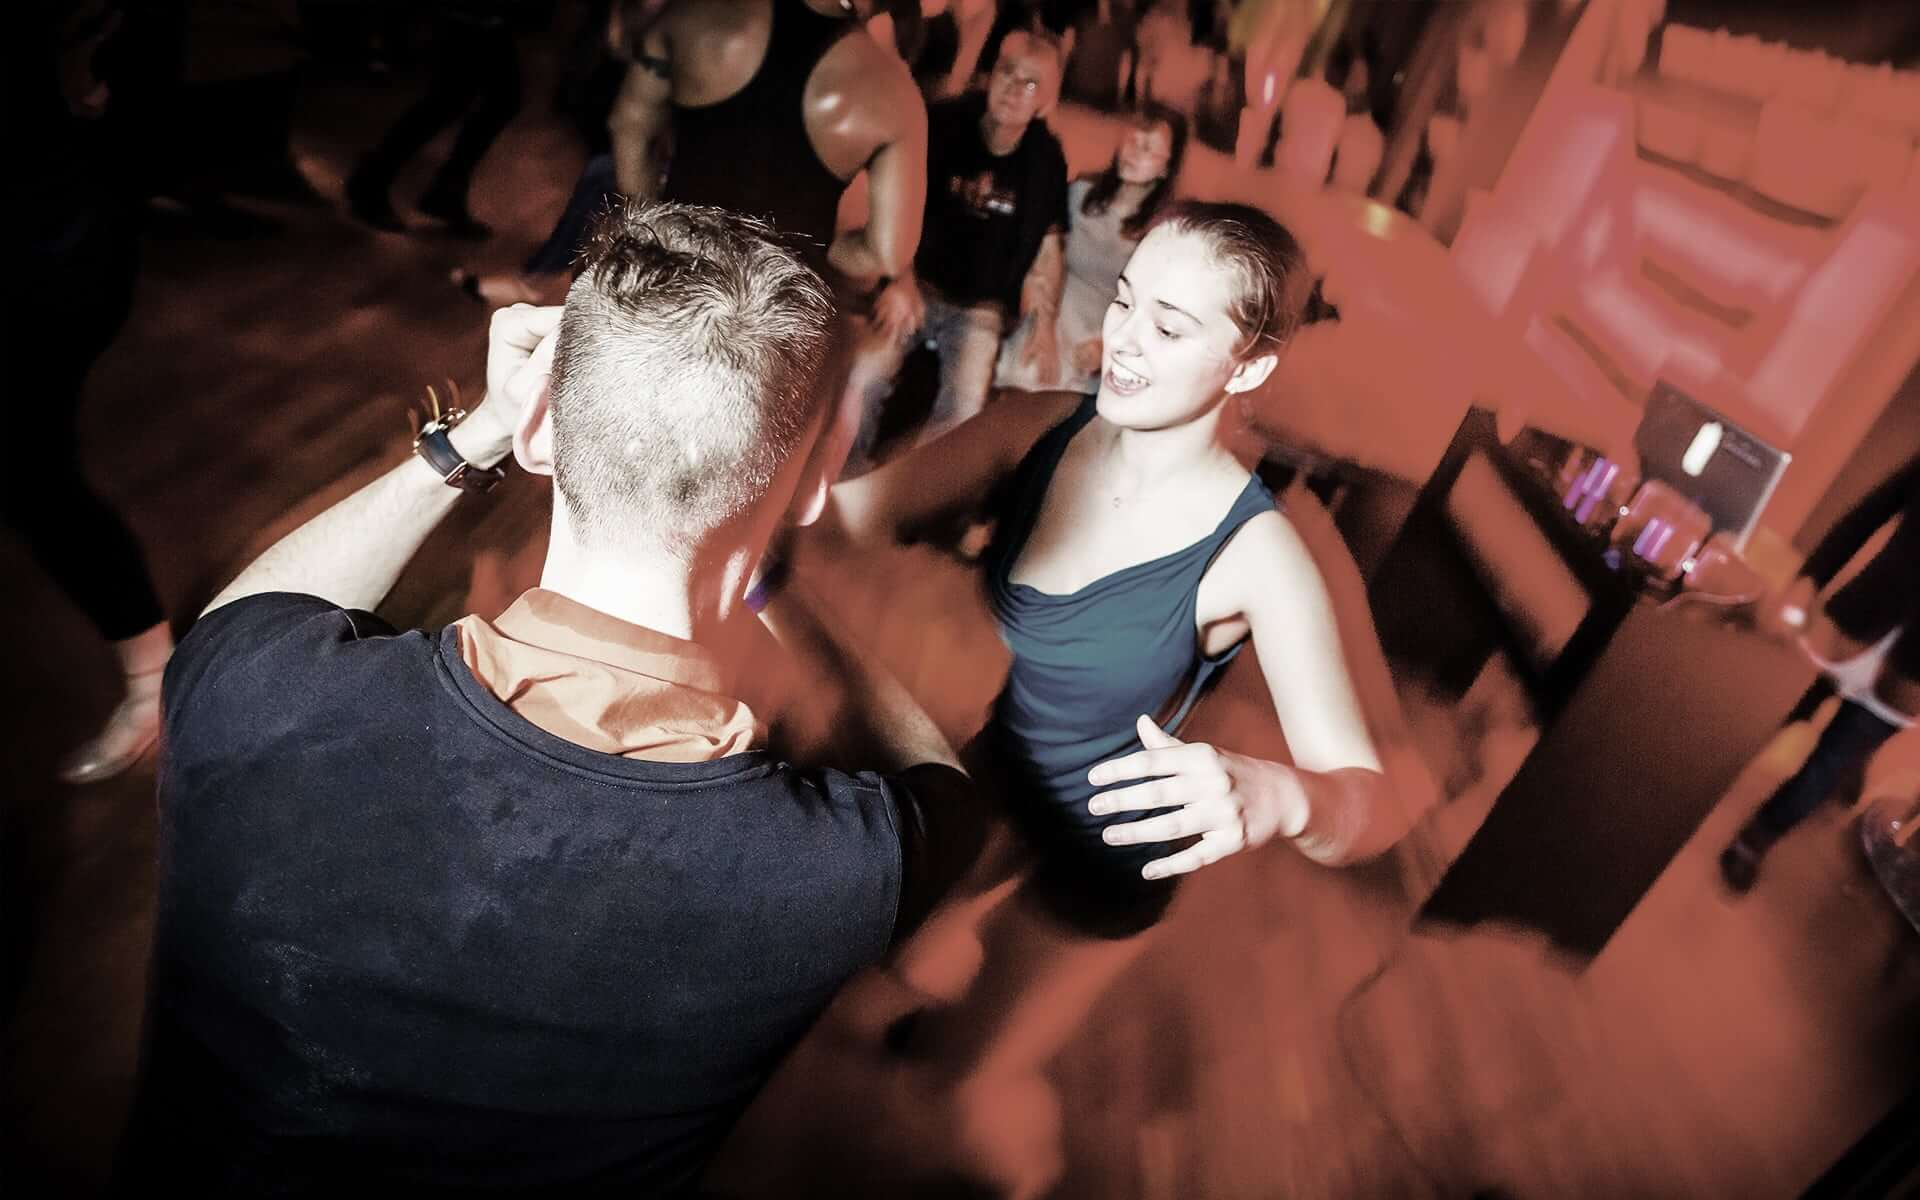 Gesellschaftstanz Party Pärchen Tanz